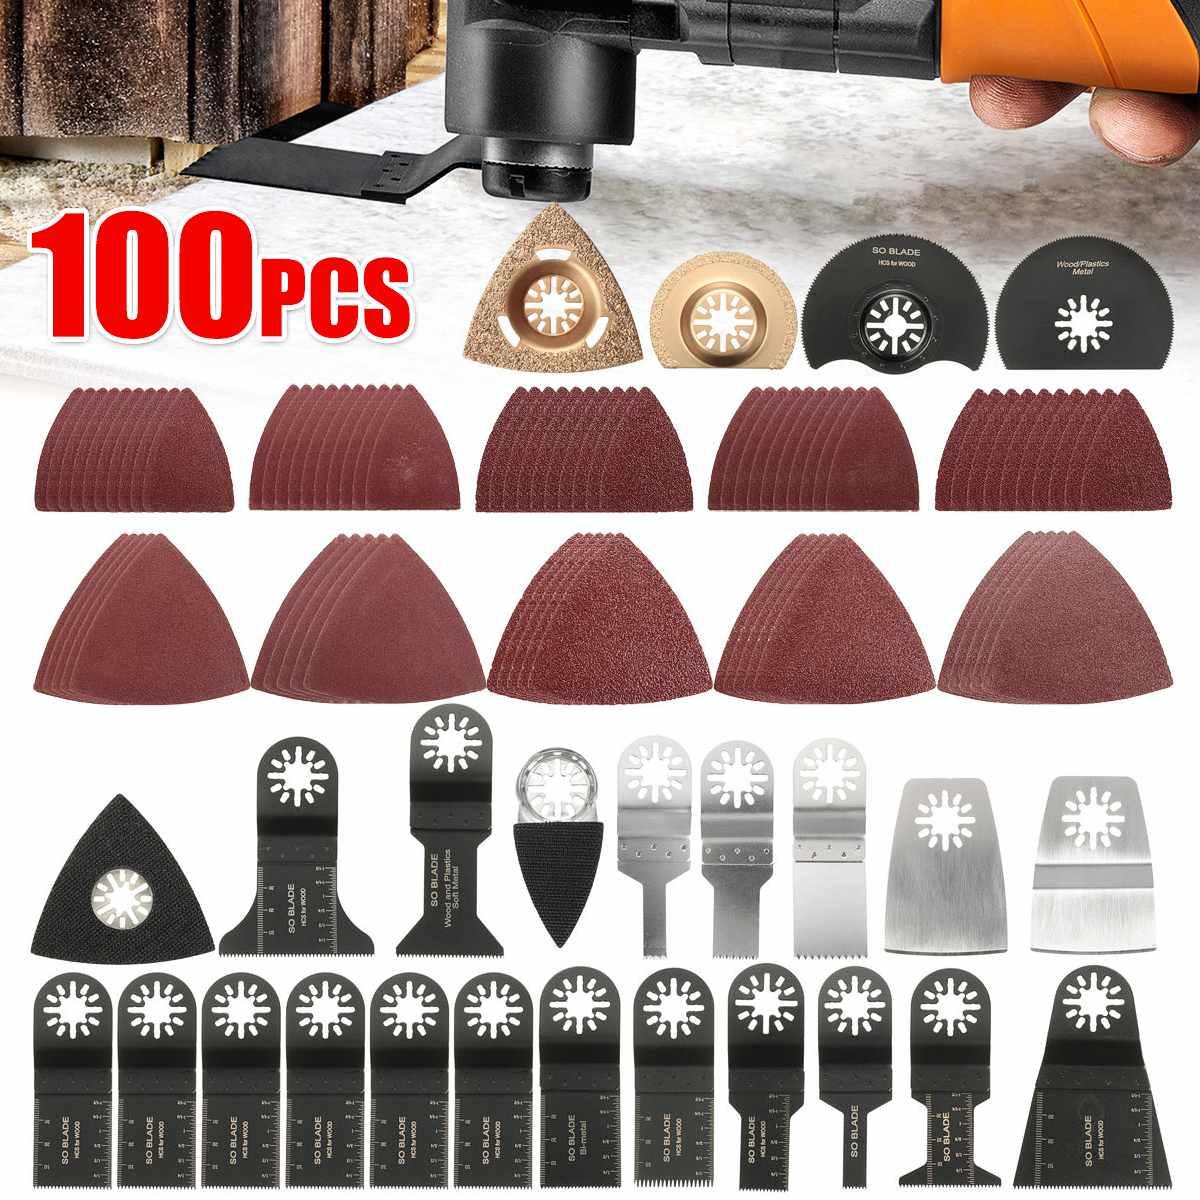 Drillpro 100pcs Mix Oscillating Multitool Saw Blade For Fein Makita Oscillating Tools